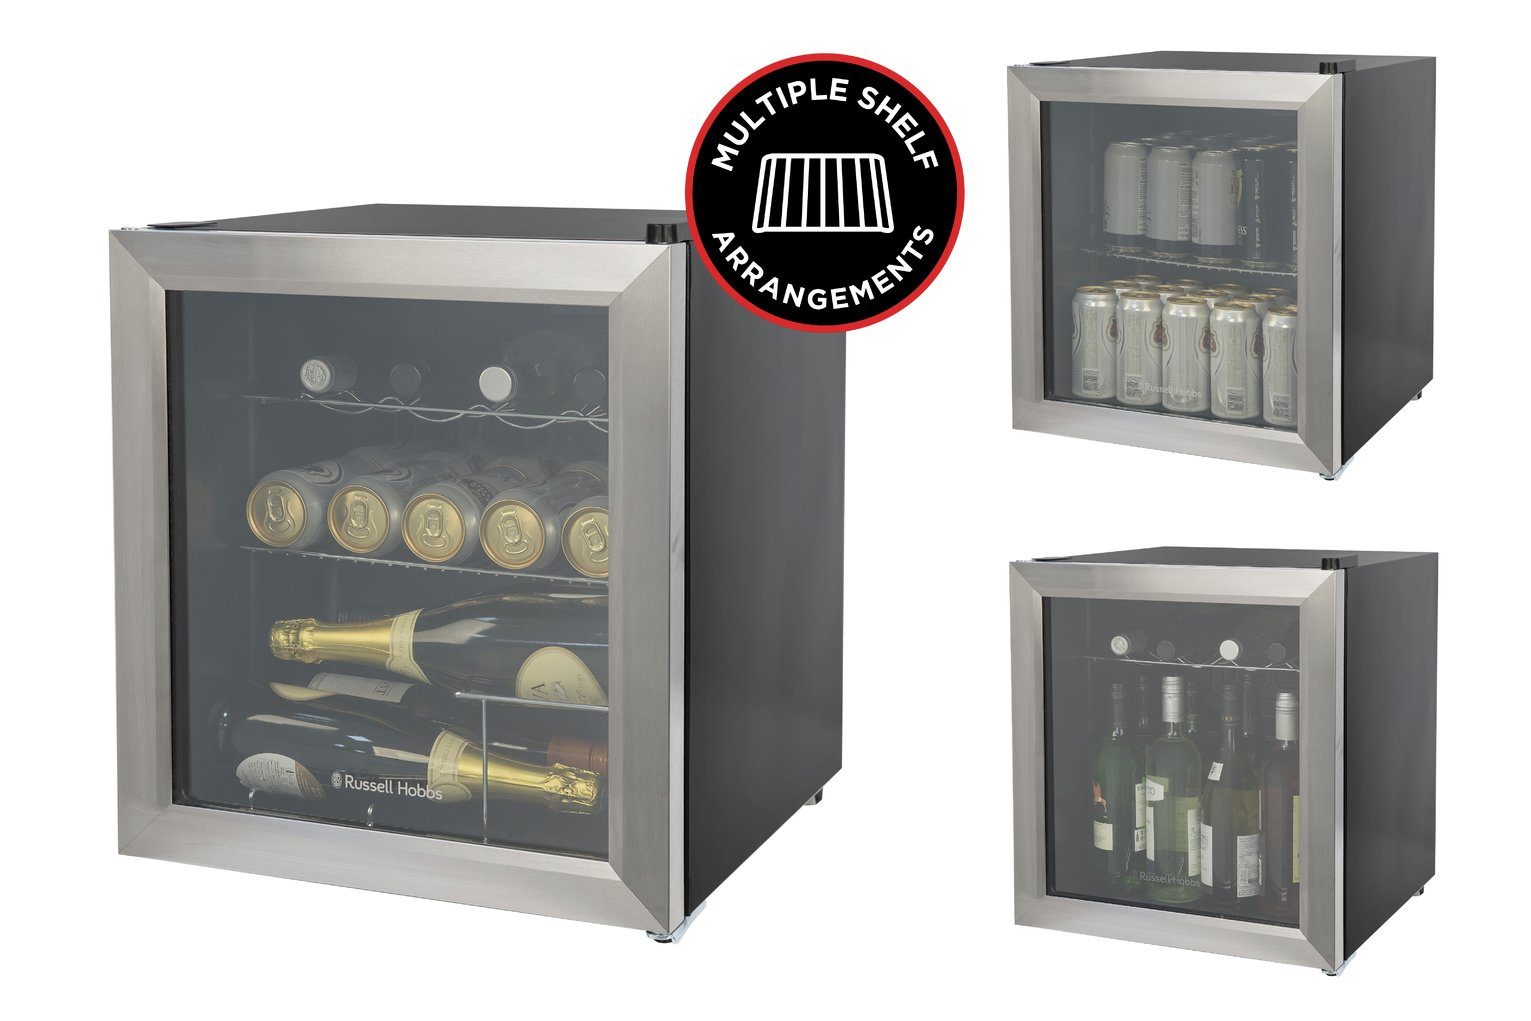 Russell Hobbs 12 Bottle Wine Cooler - Stainless Steel